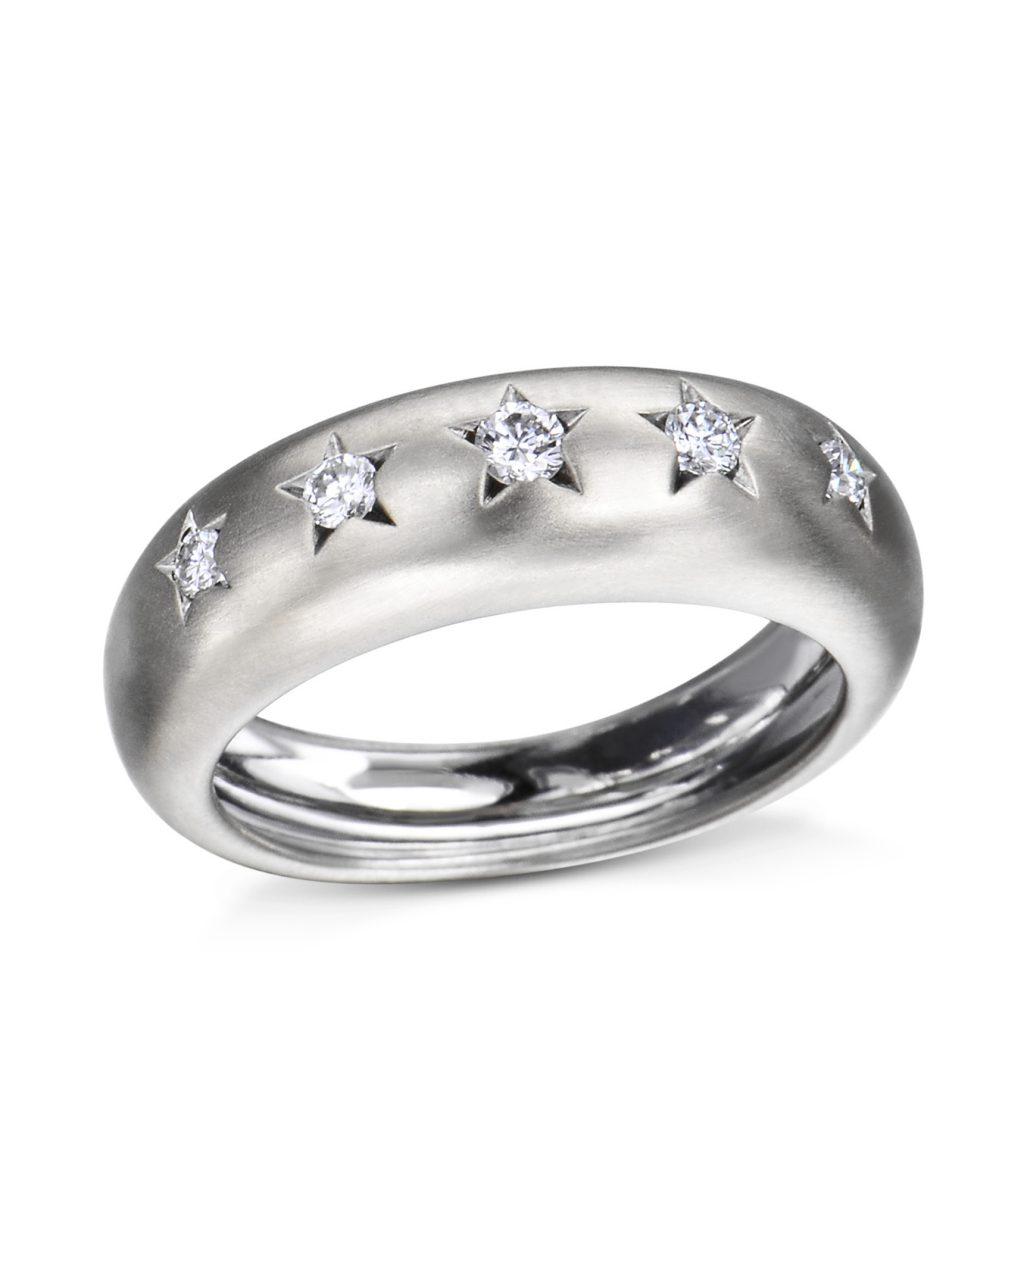 Star Design Diamond Wedding Band